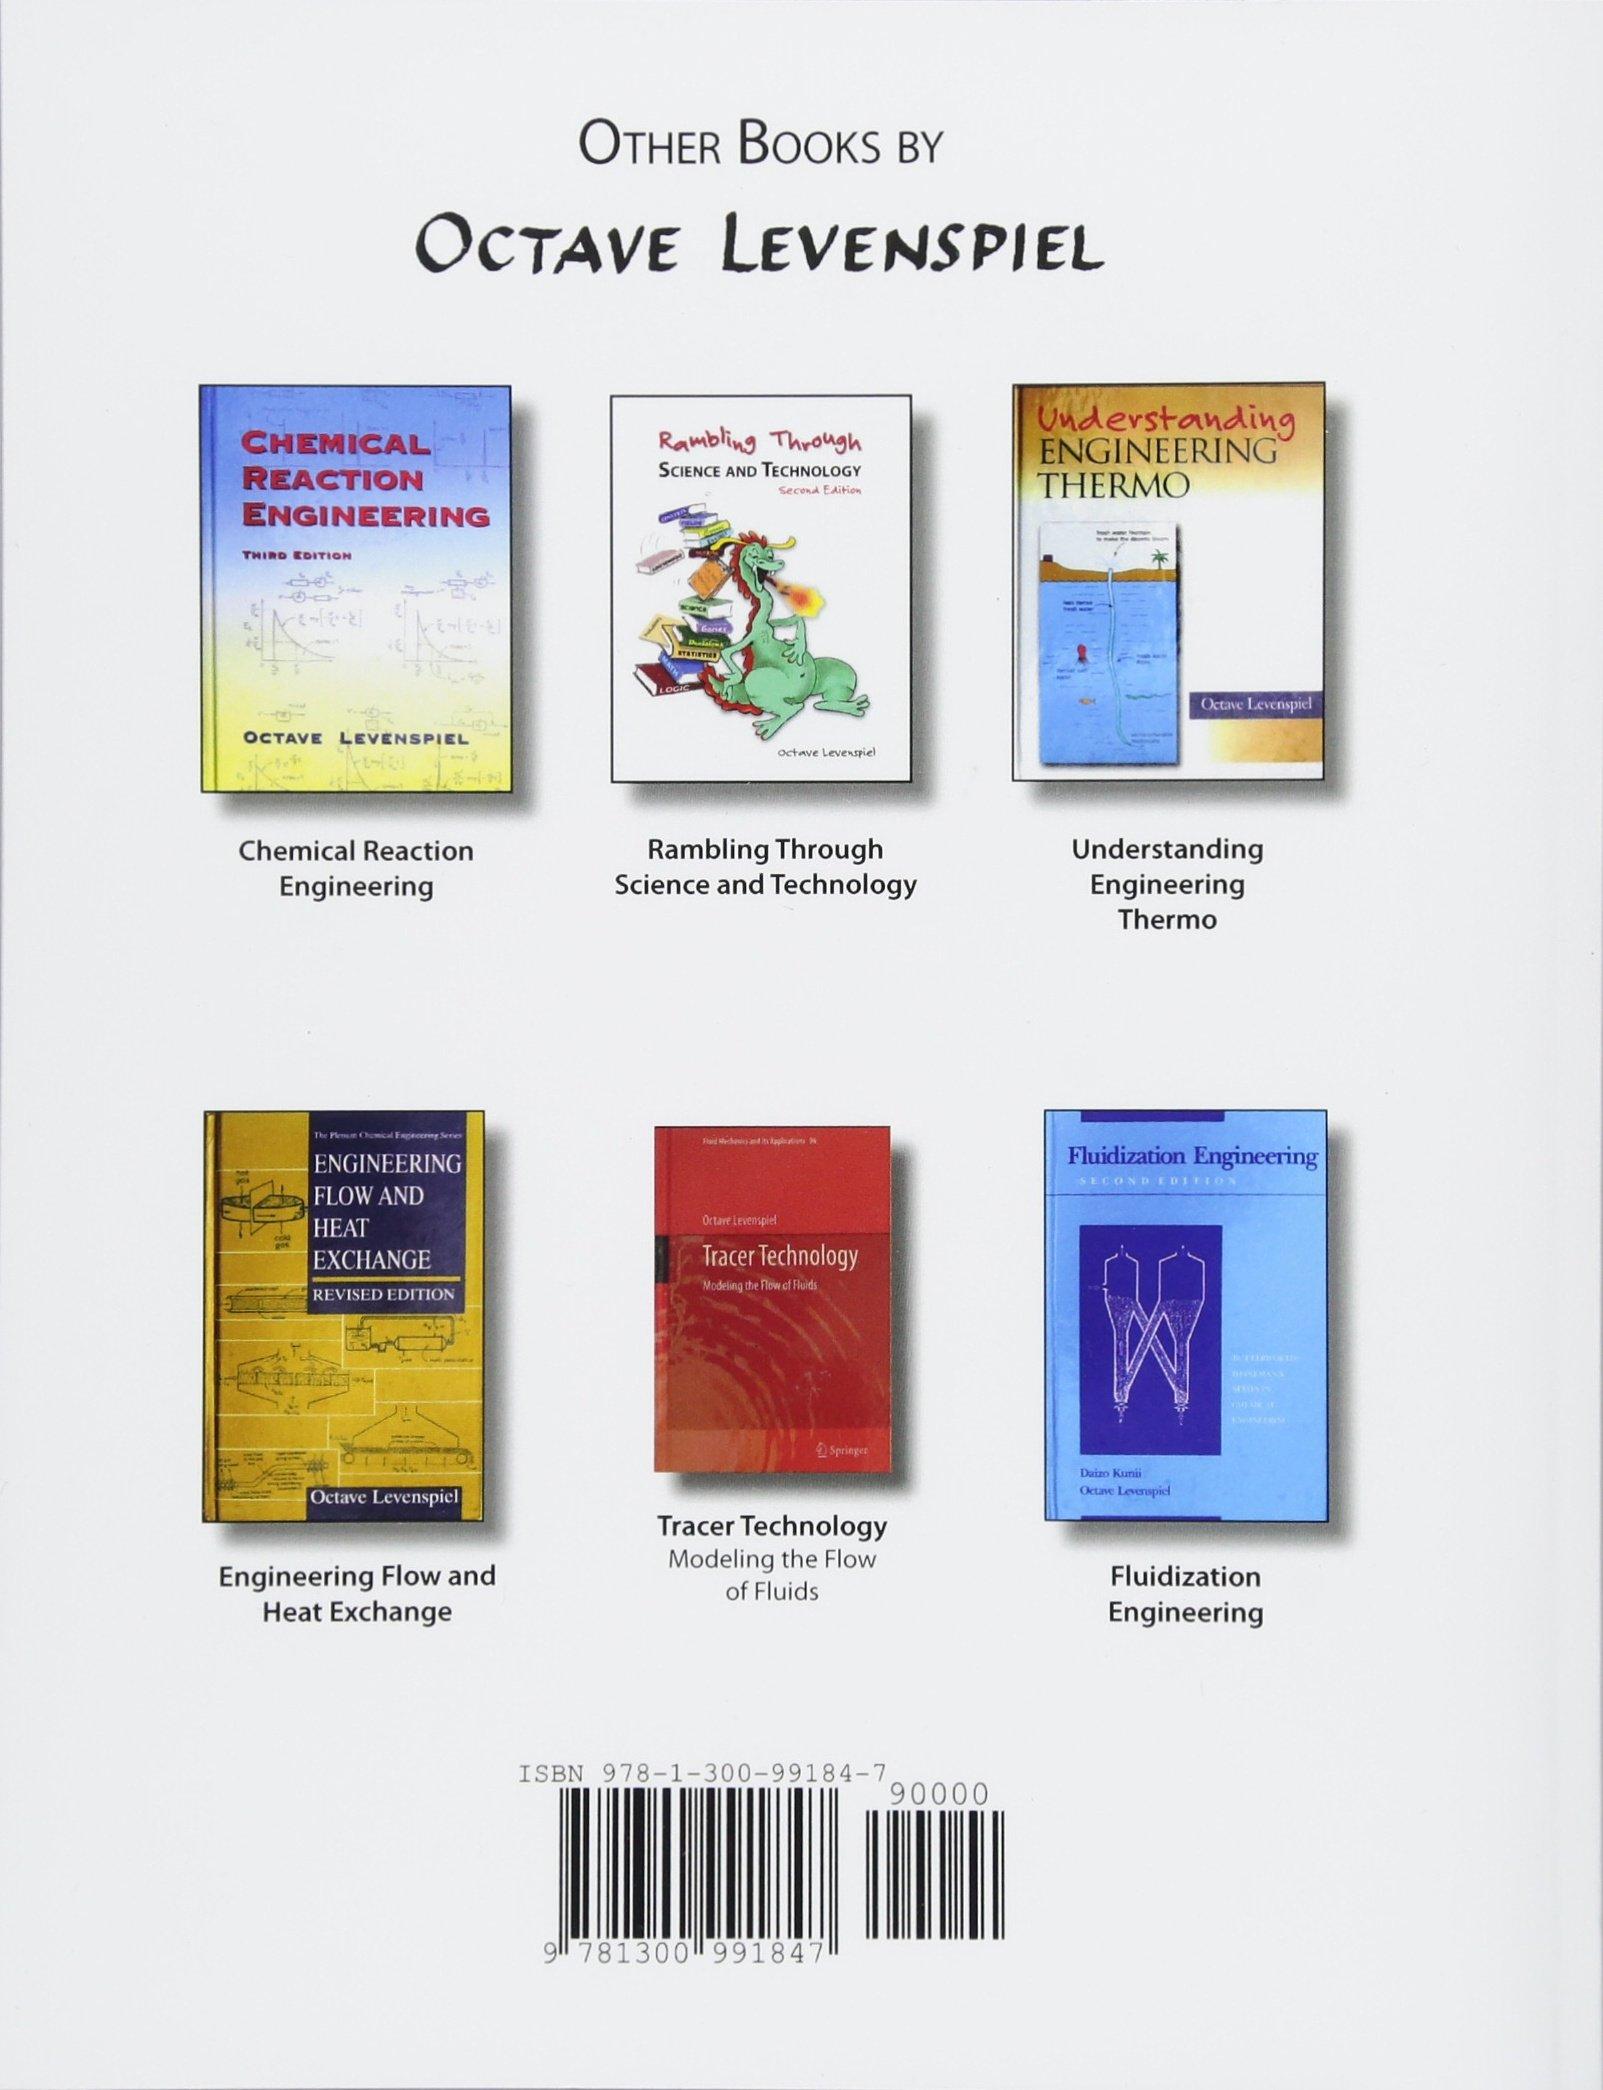 omnibook levenspiel